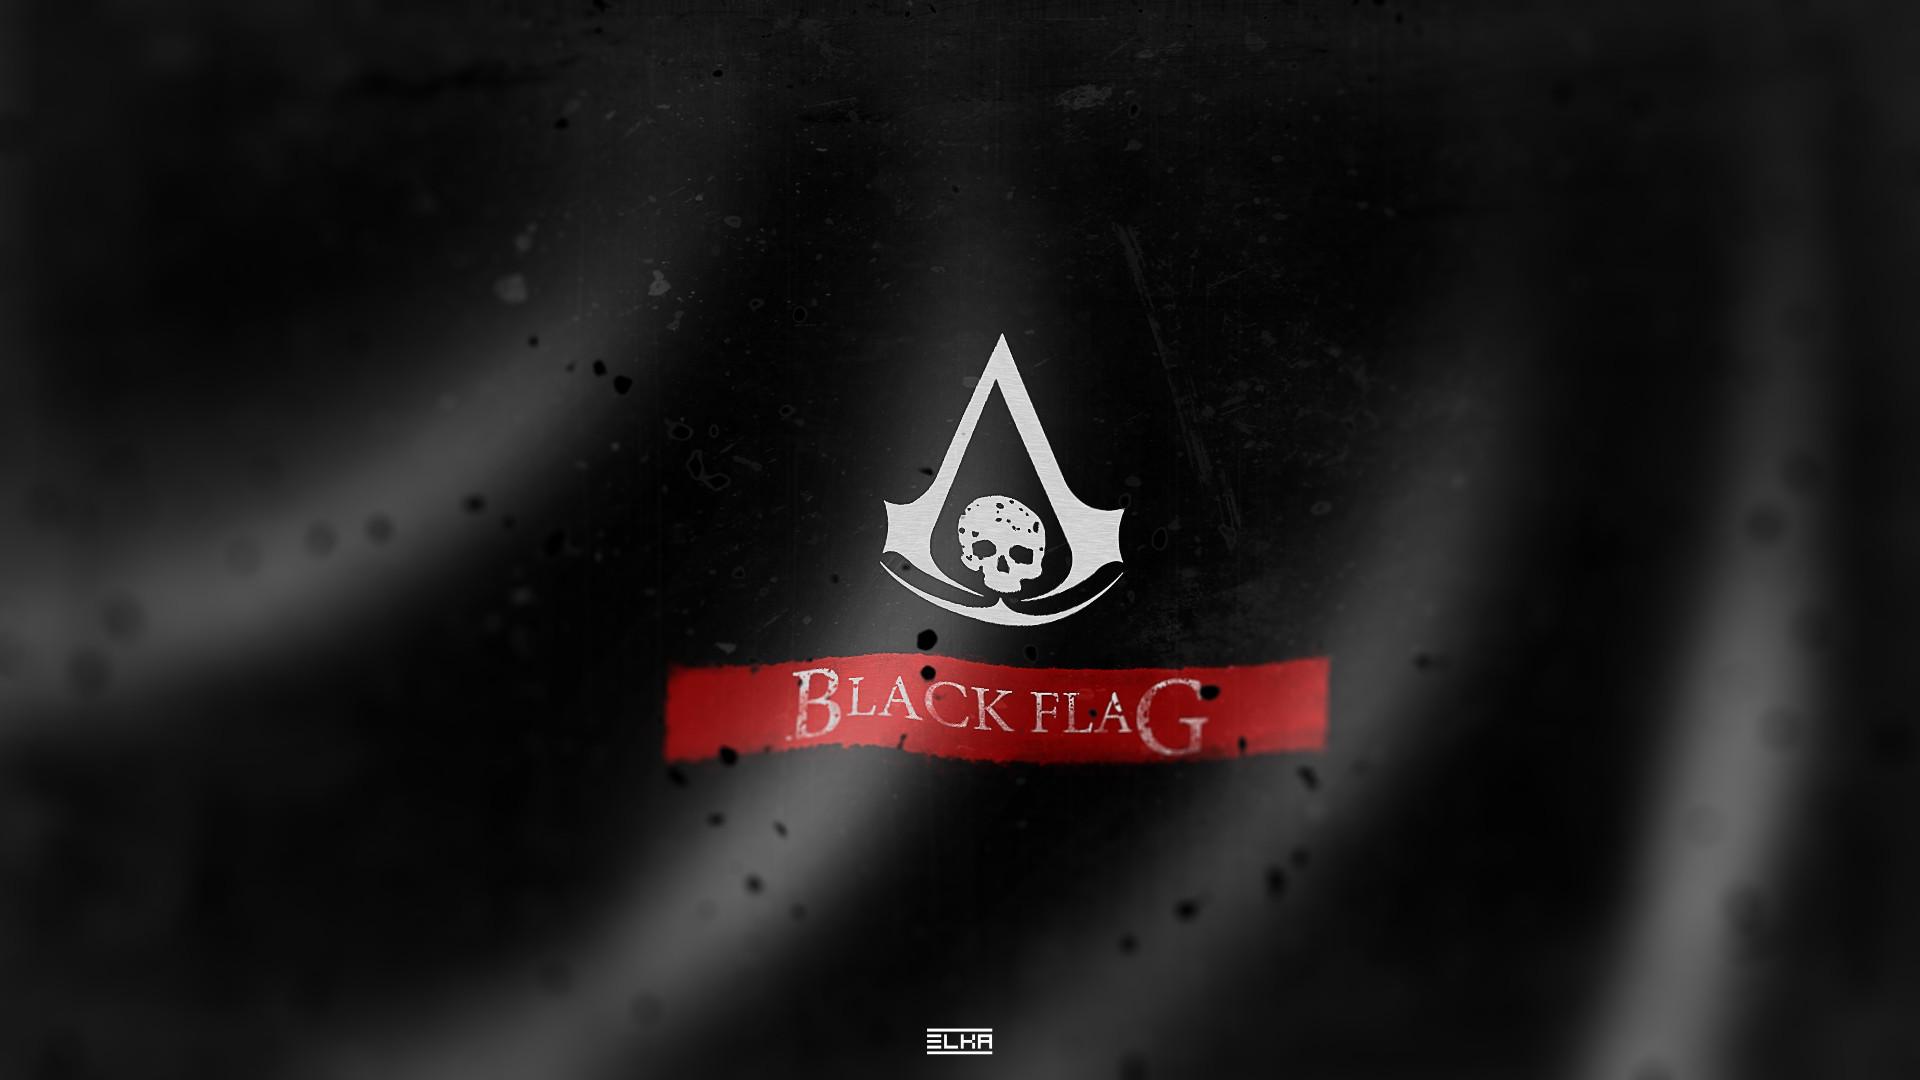 Assassins Creed 4 Black Flag Logo Wallpaper | Game HD Wallpaper